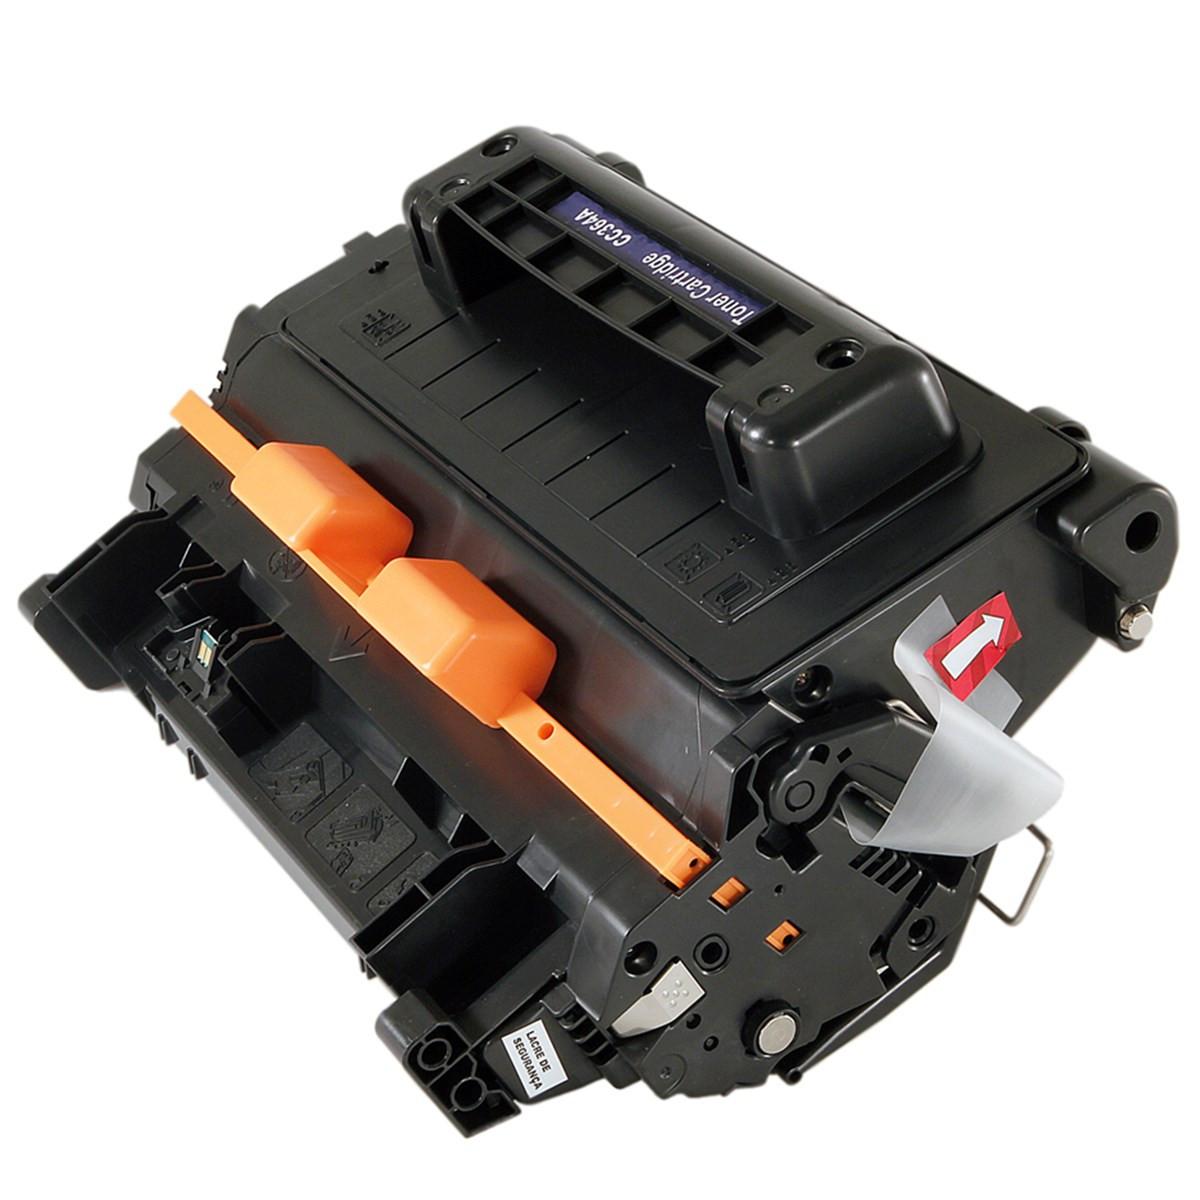 Toner Compatível com HP CC364A | P4015DN P4015X P4015N P4515N P4515XM P4015TN P4515TN | Premium 10k